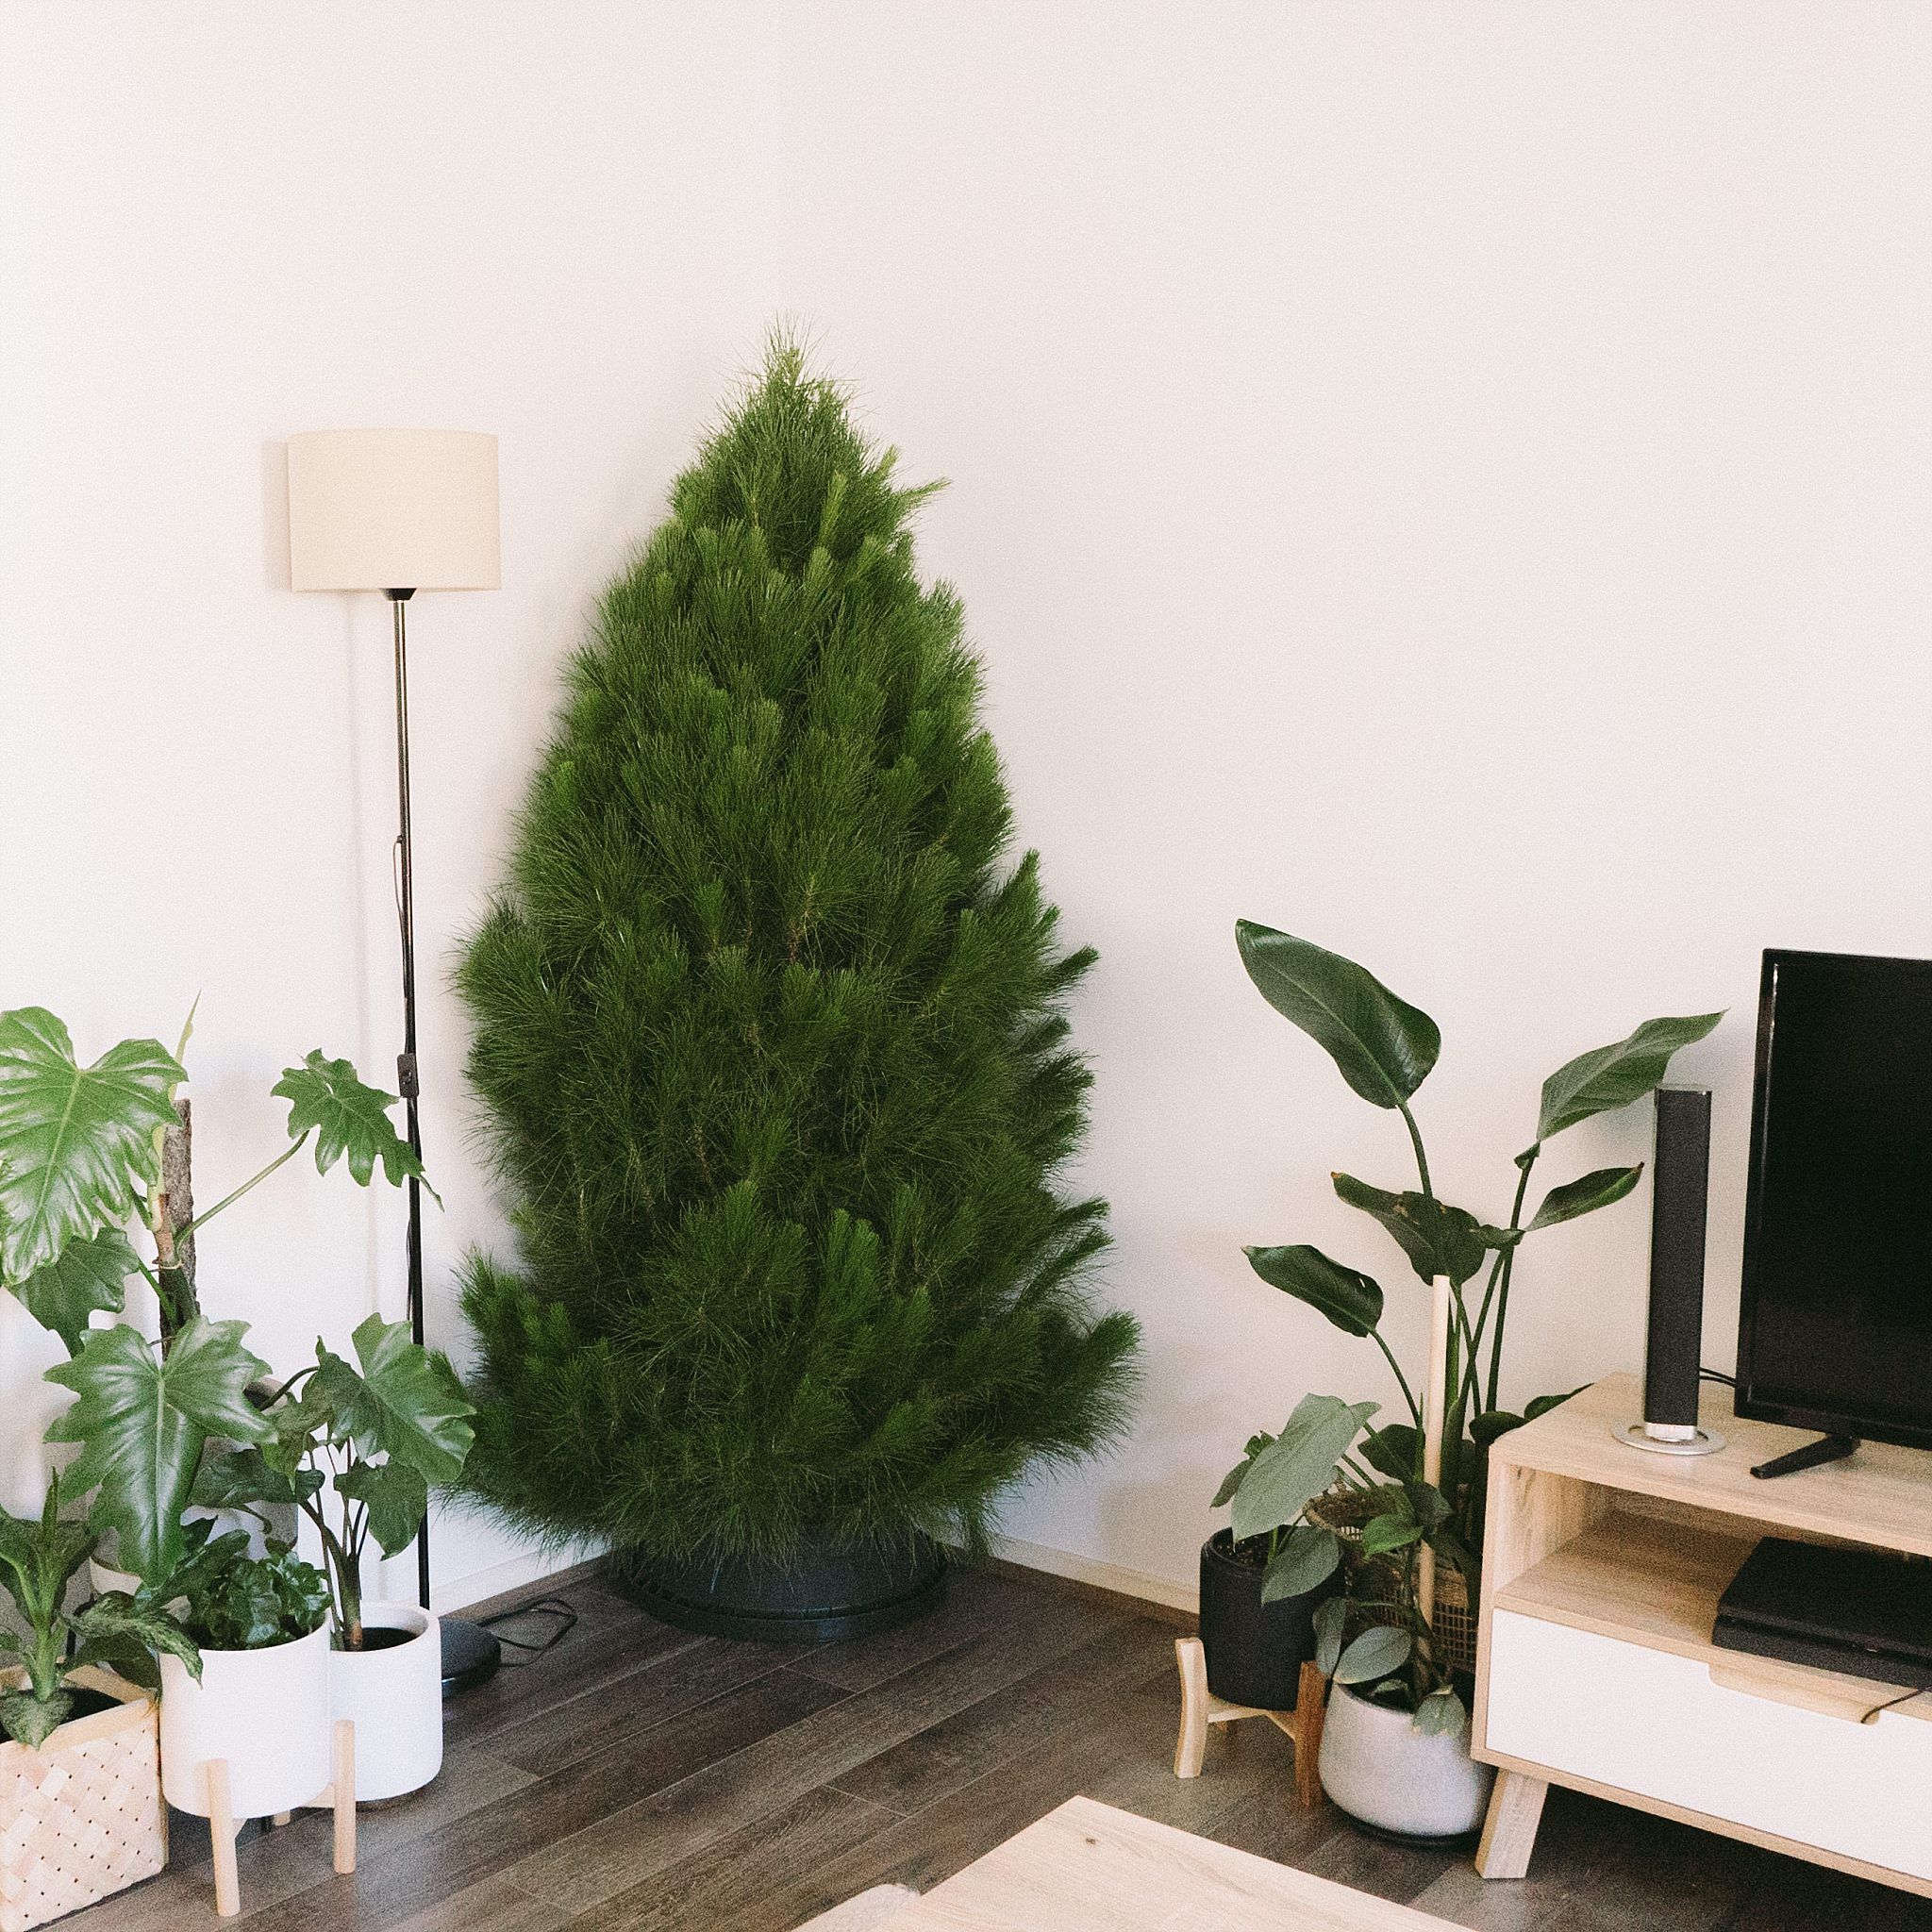 2018-November-30 Holidays 12.jpg